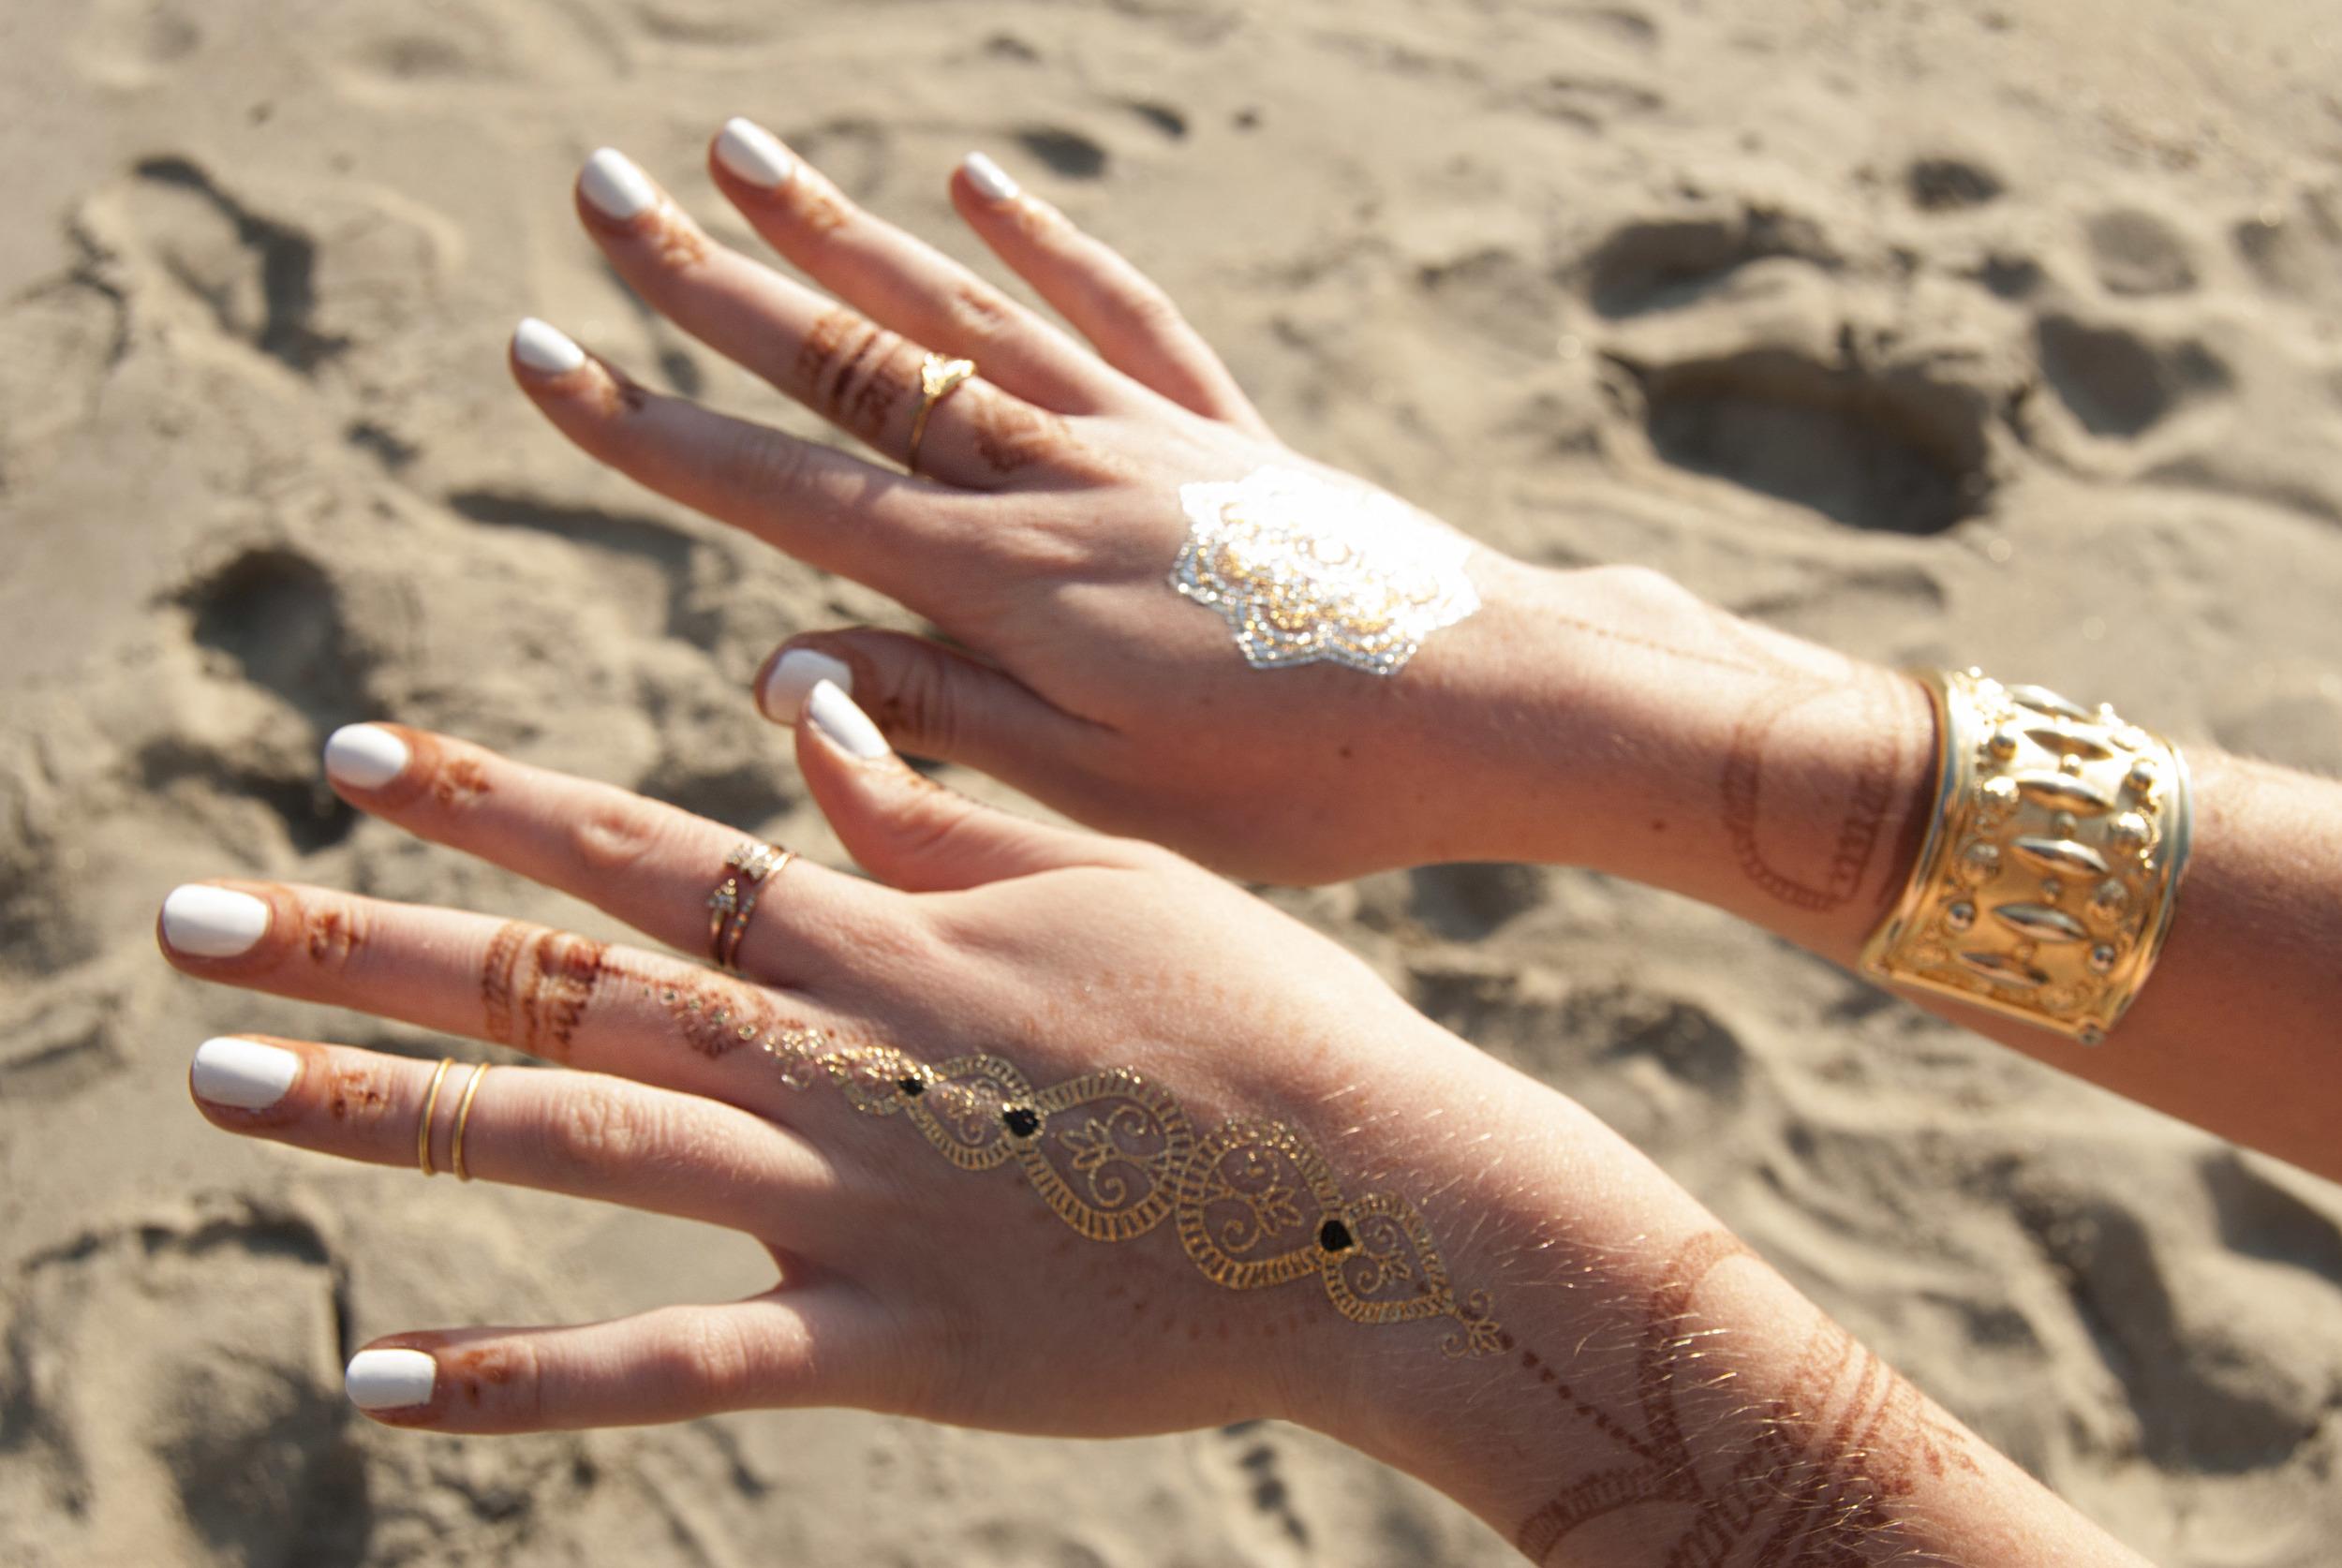 Flash Tattoos and Henna (via Girl x Garment)